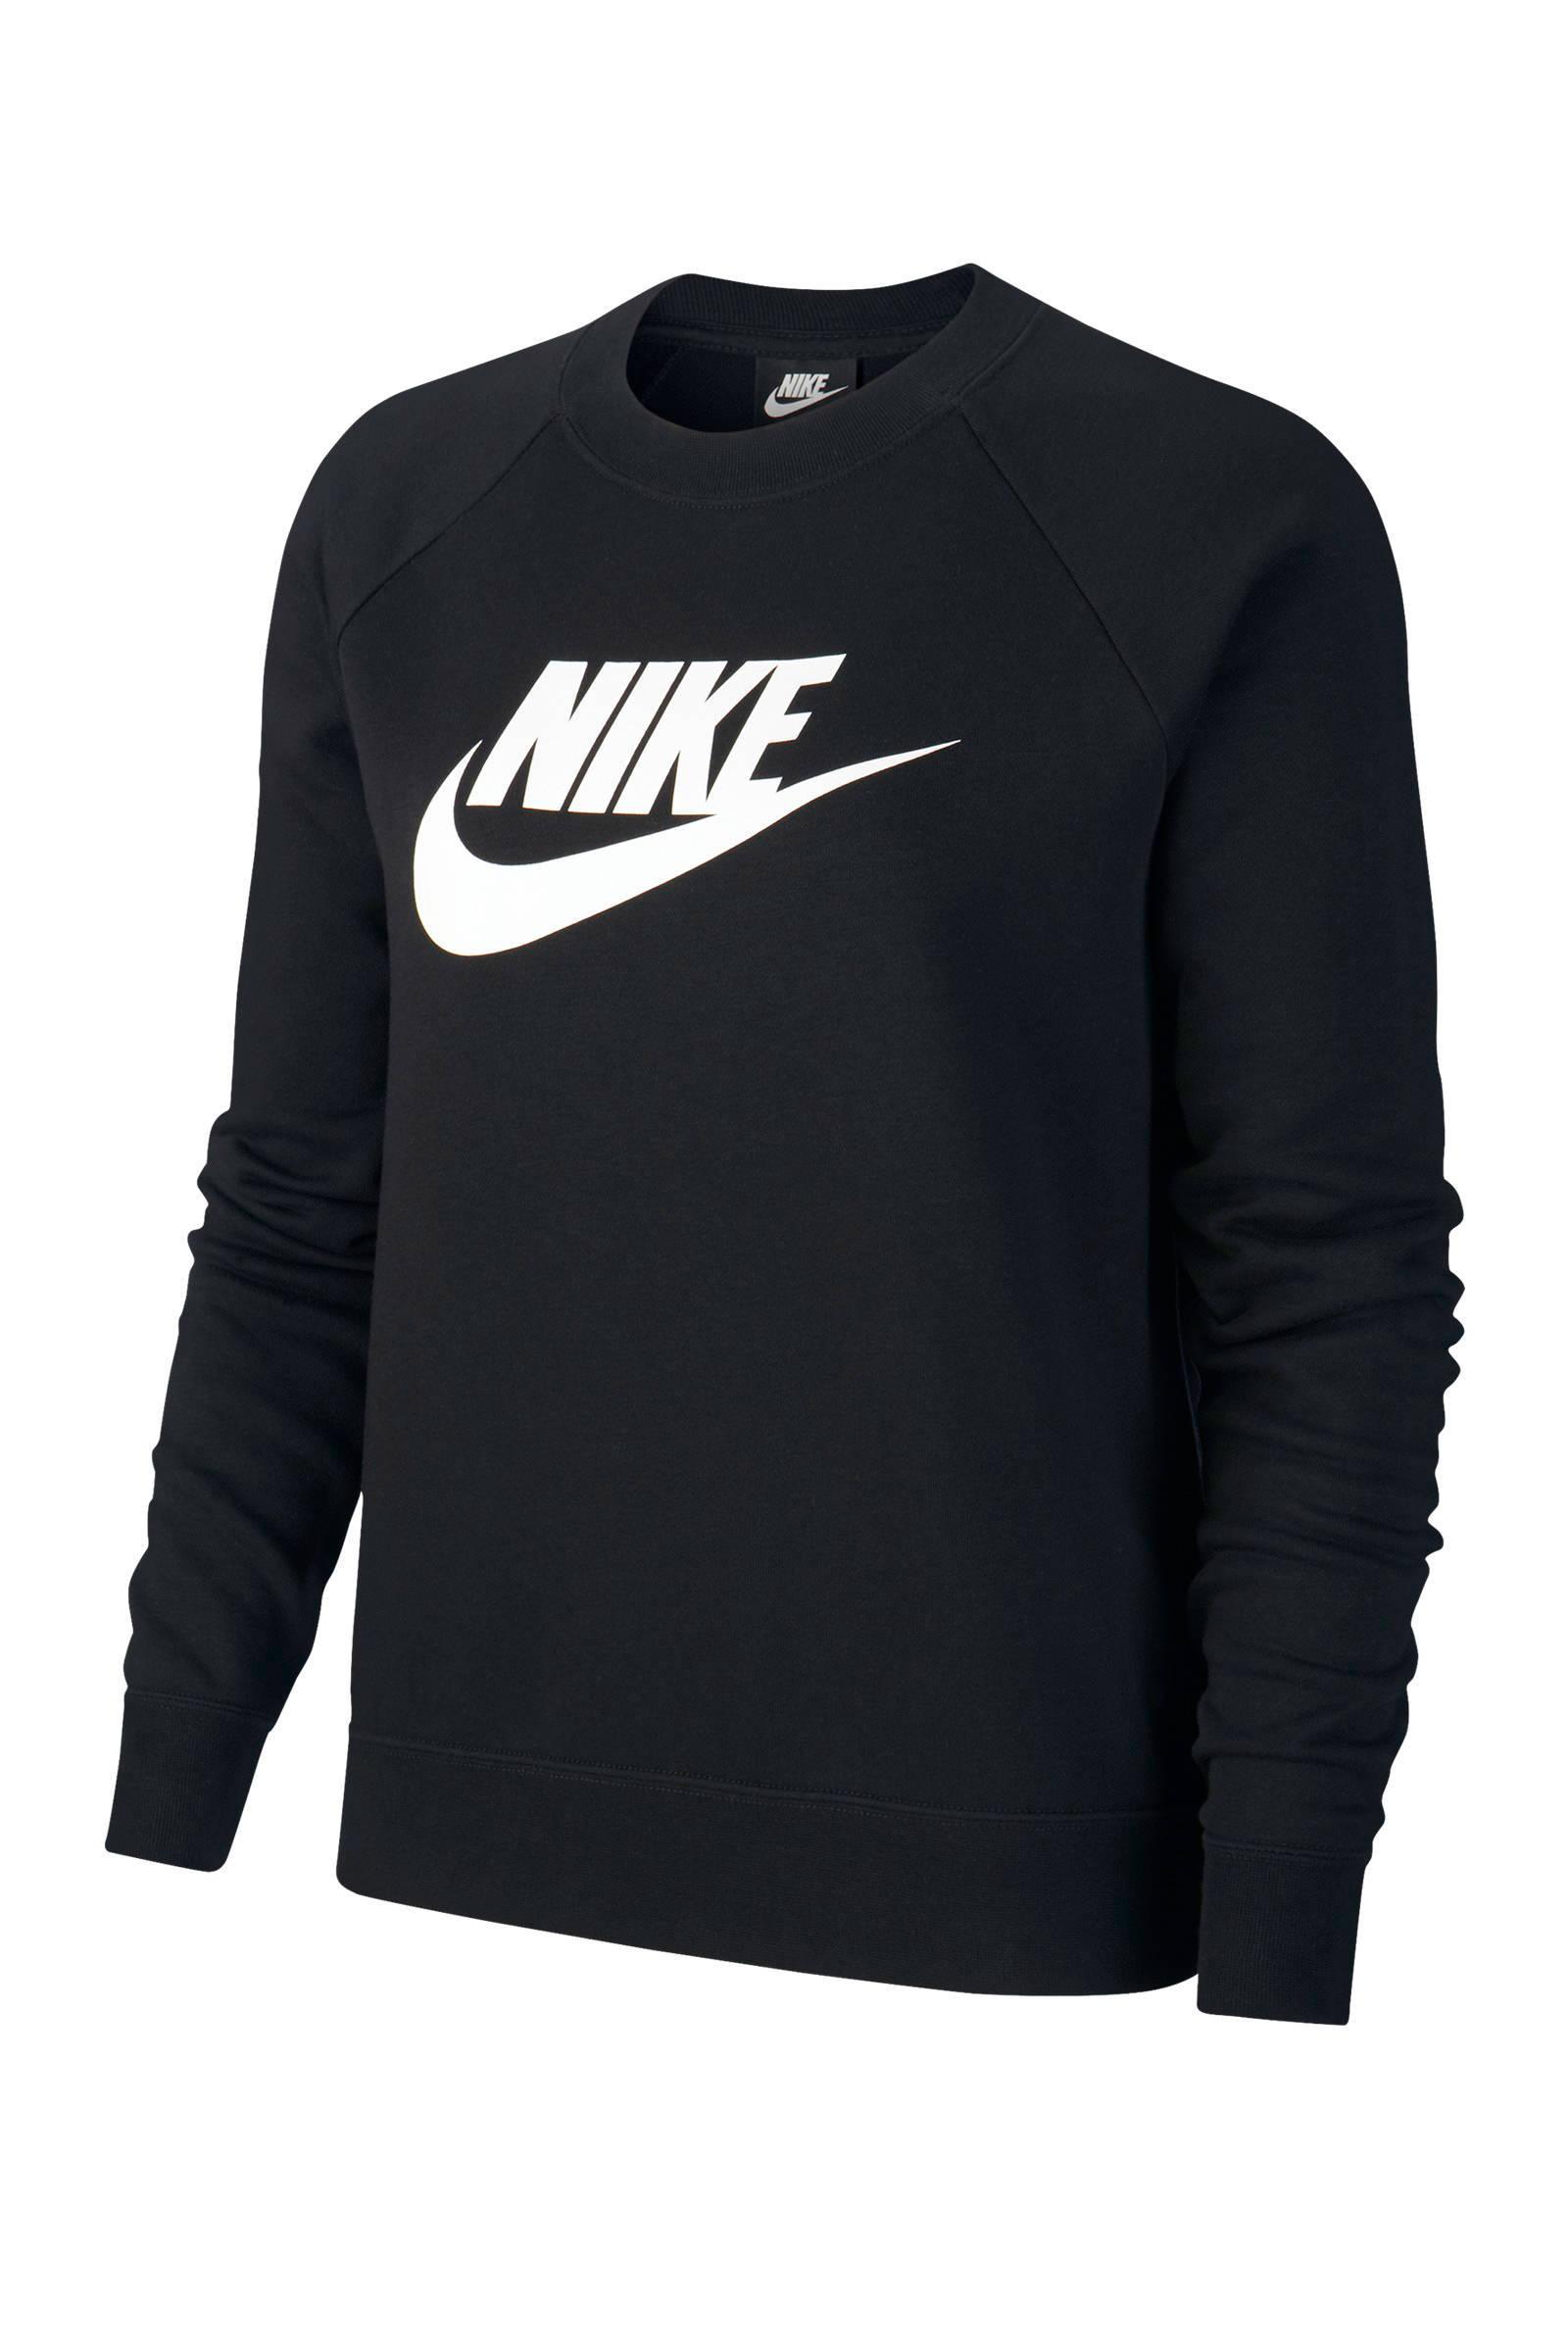 Nike sweater geel | wehkamp